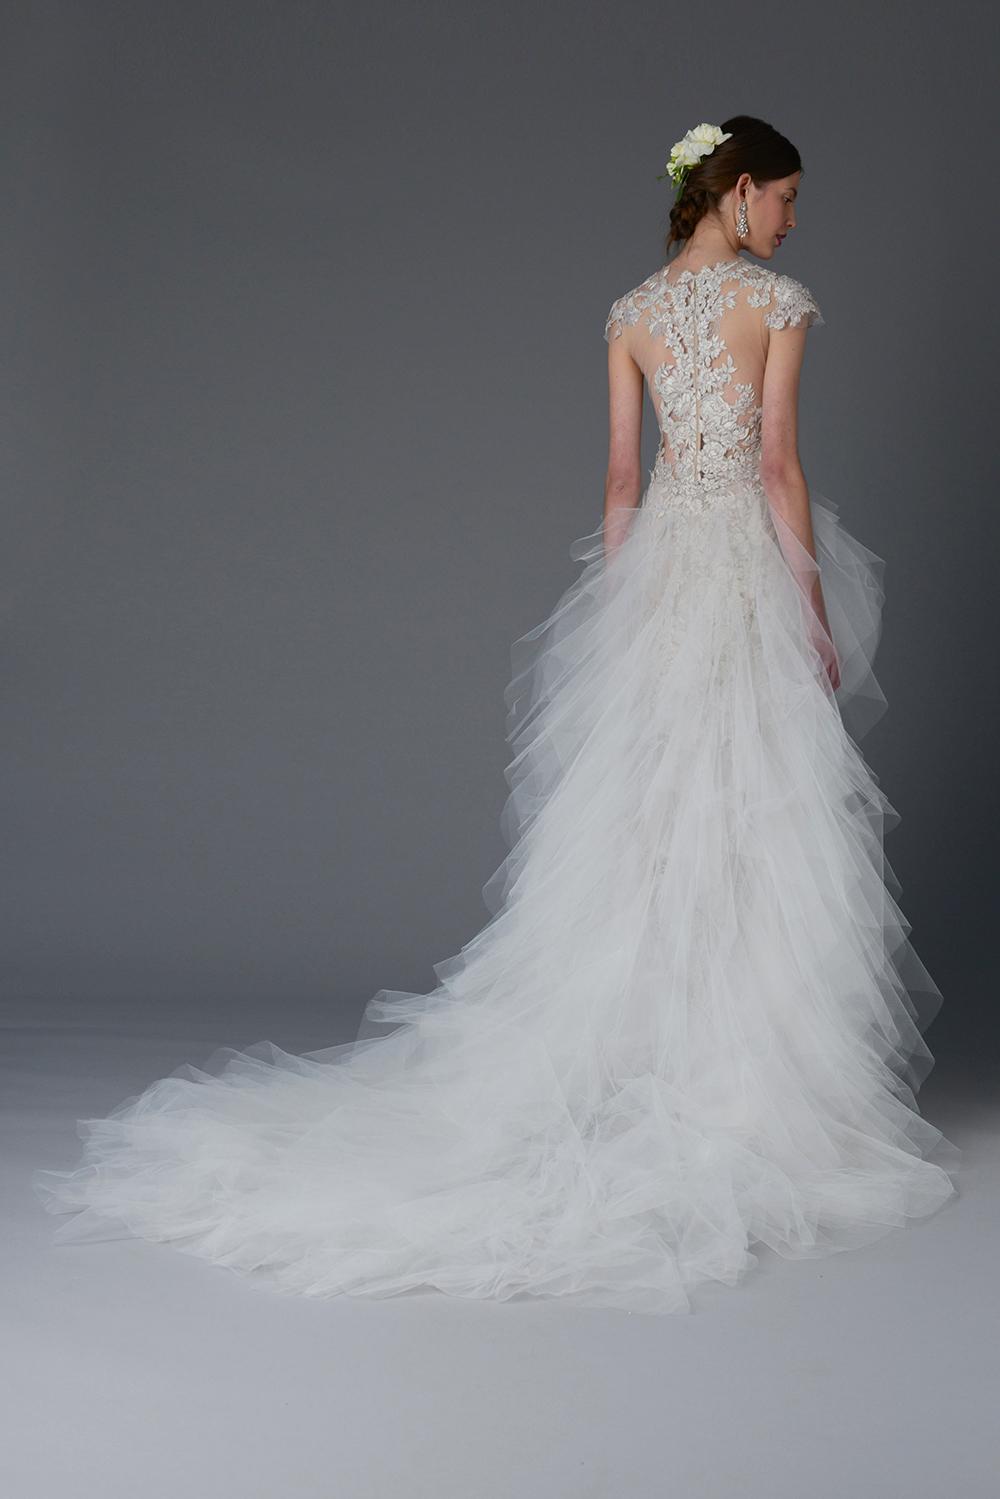 Silene - Marchesa Spring 2017 Bridal Collection. www.theweddingnotebook.com